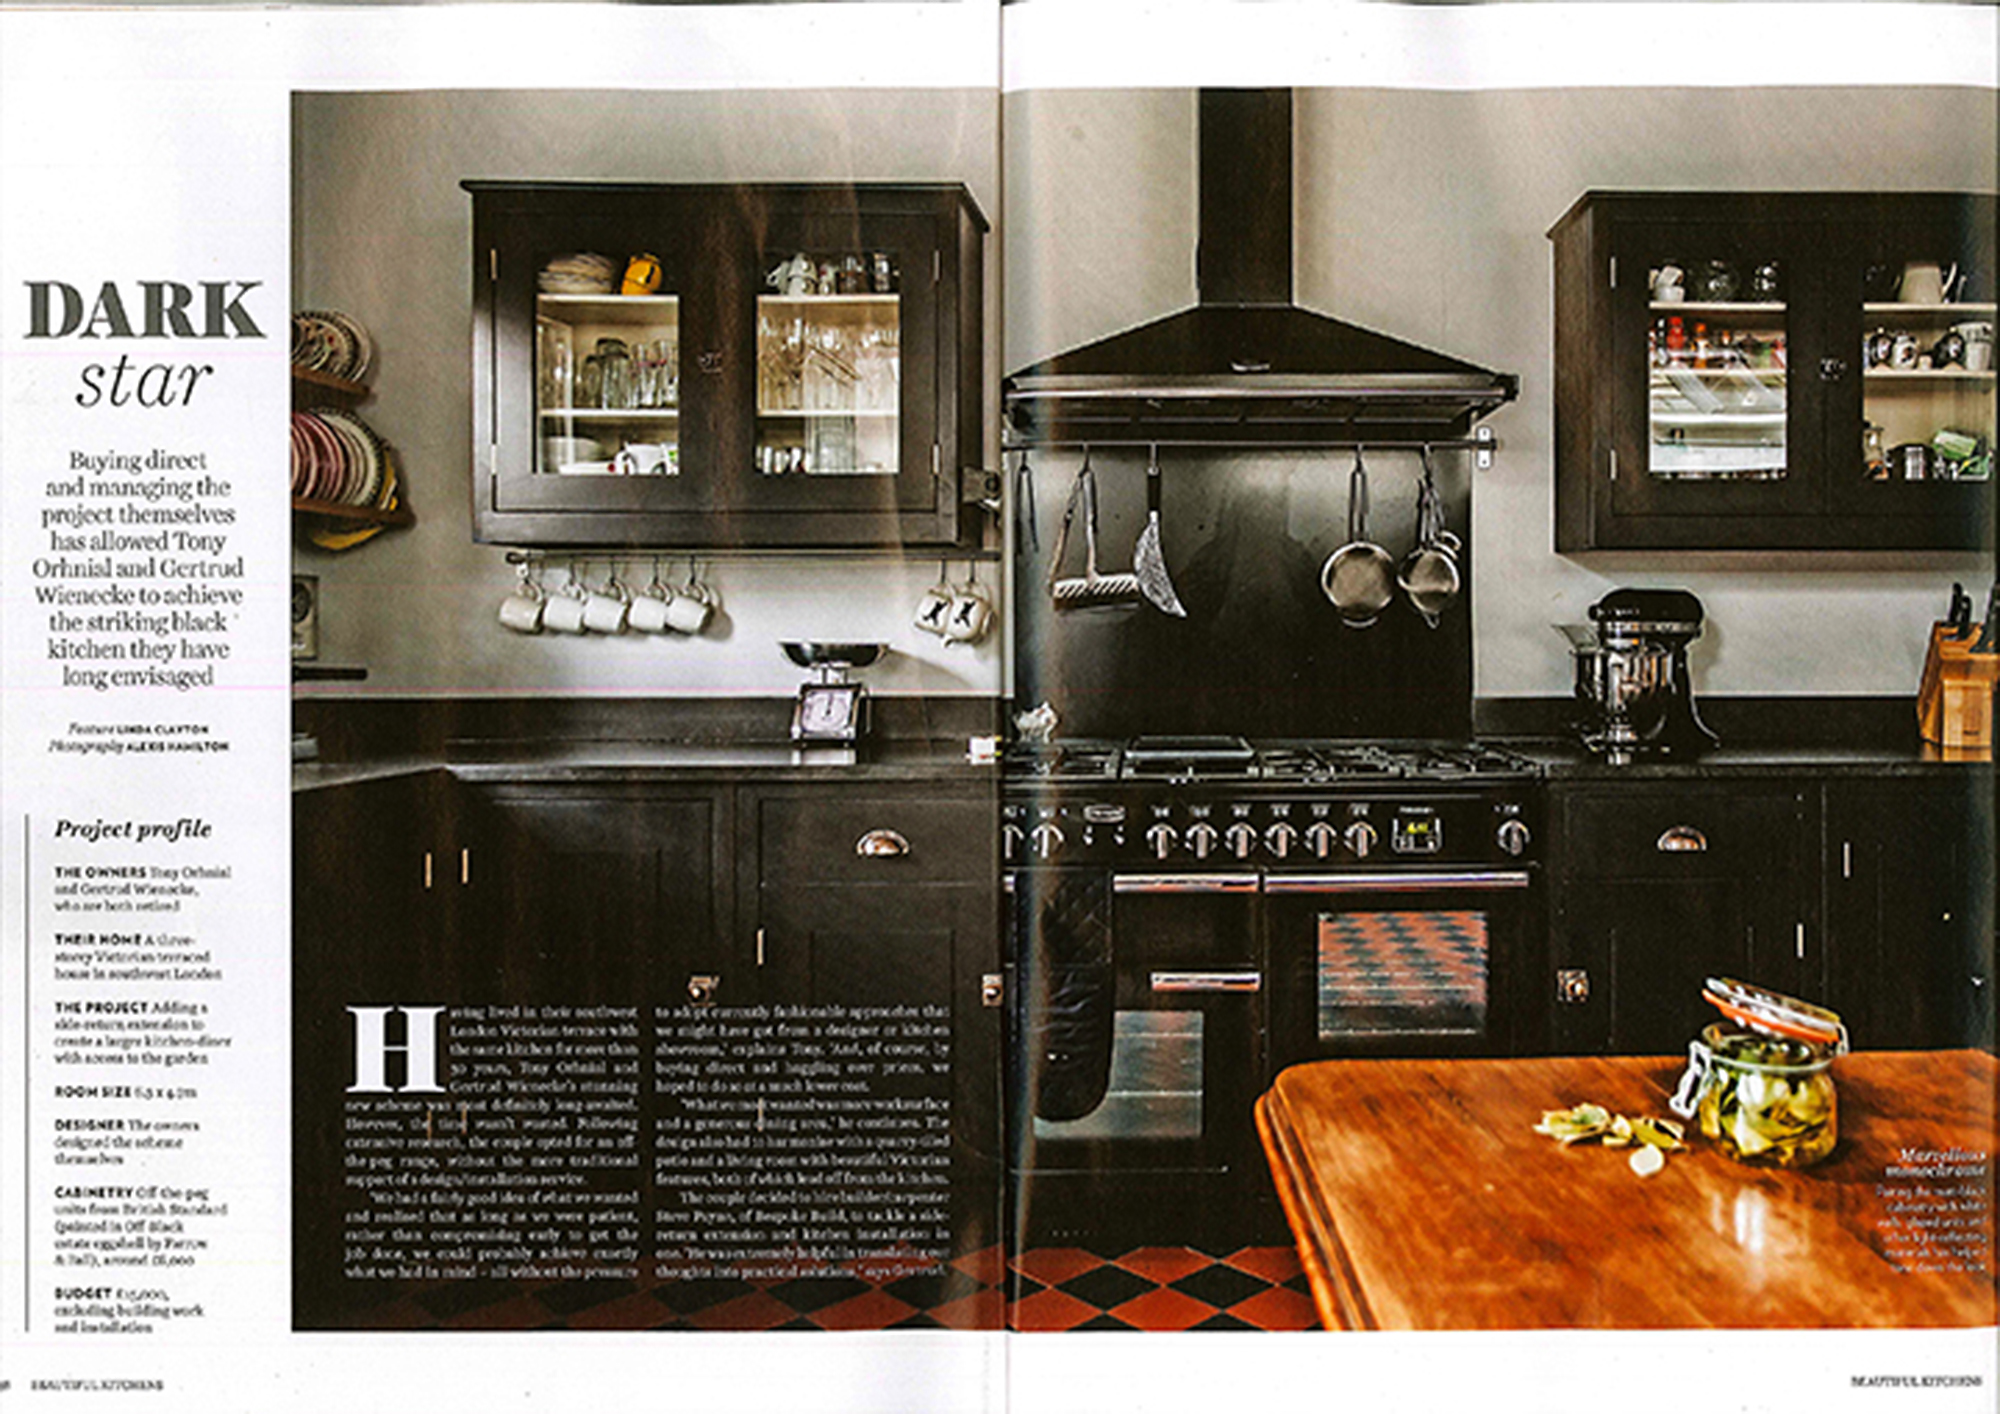 British-Standard-Beautiful-kitchens-2LR.jpg